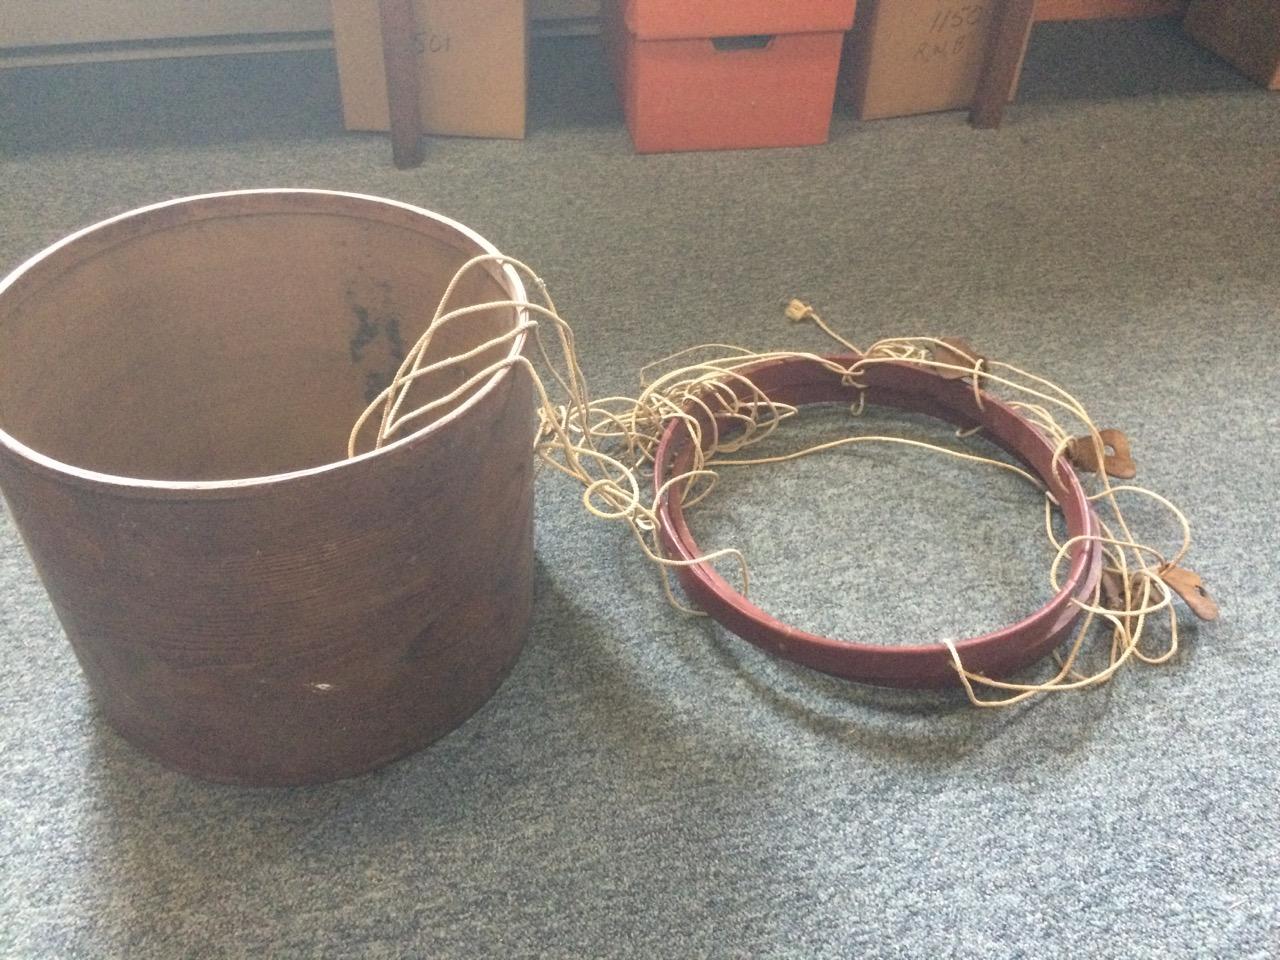 Civil War Era Marching Drum In Process